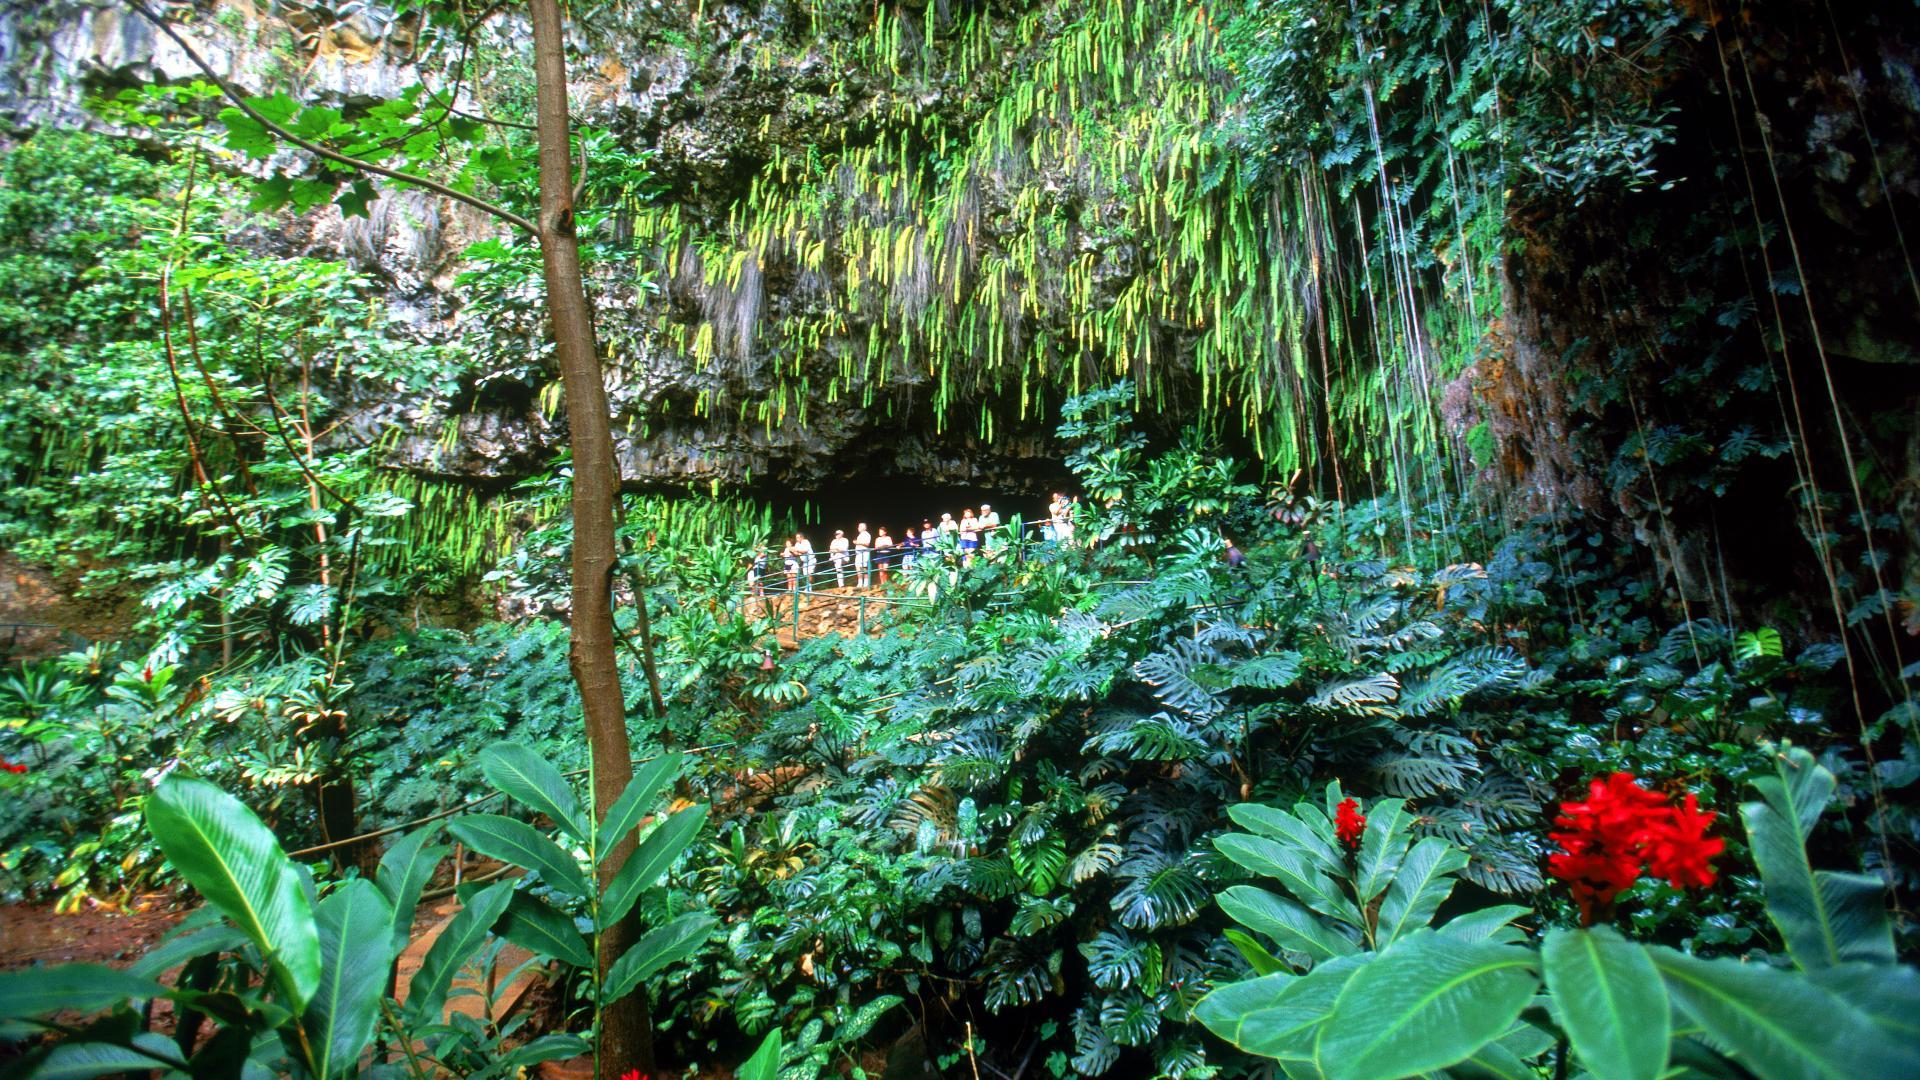 fern grotto kauai hawaii